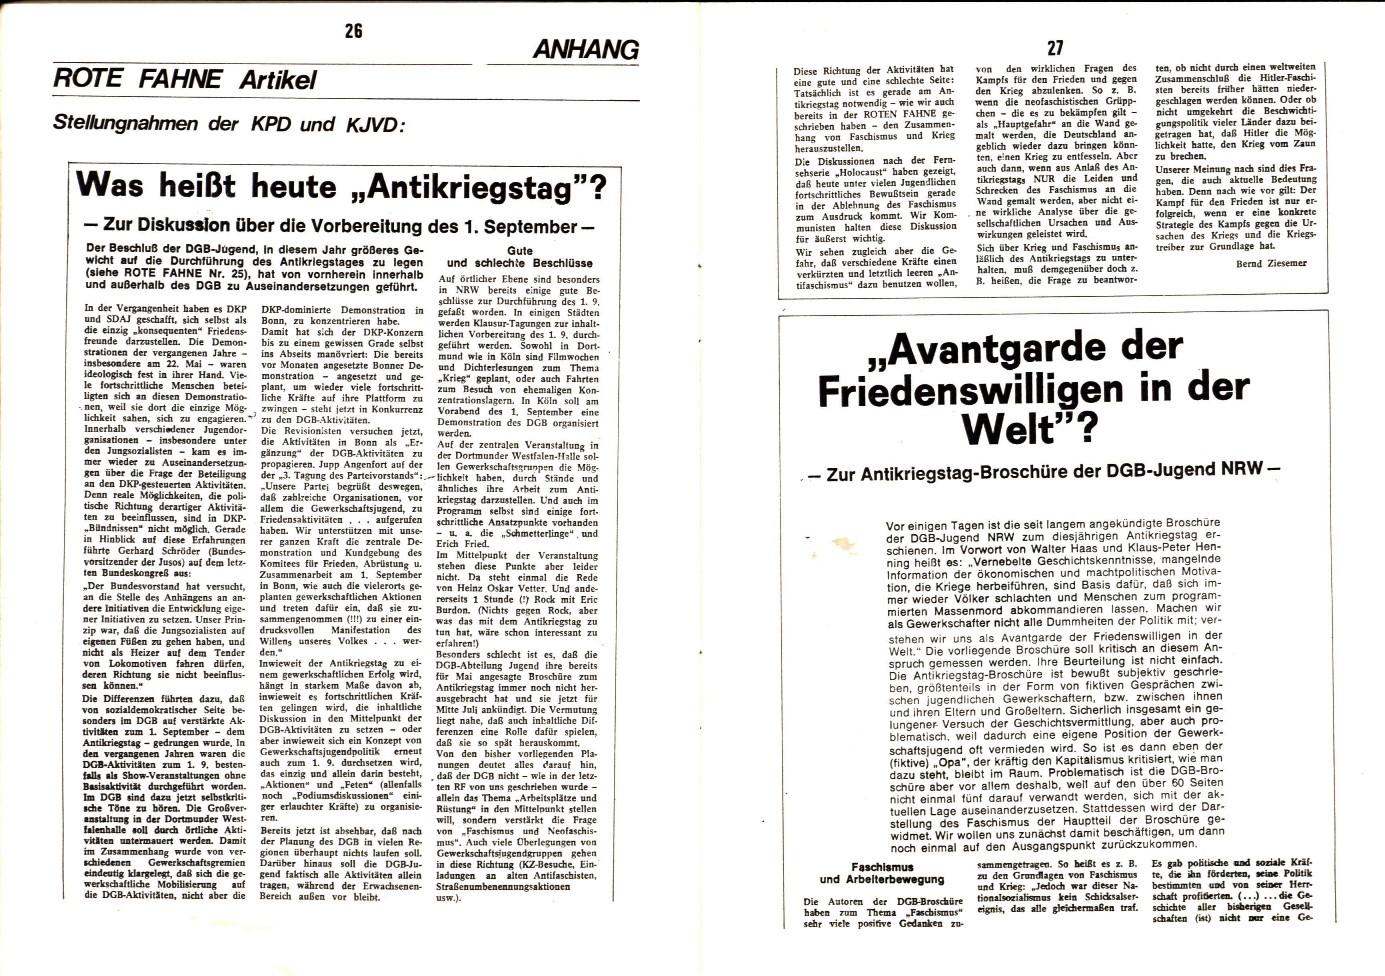 KJVD_1979_Dokumente_zum_Antikriegstag_13